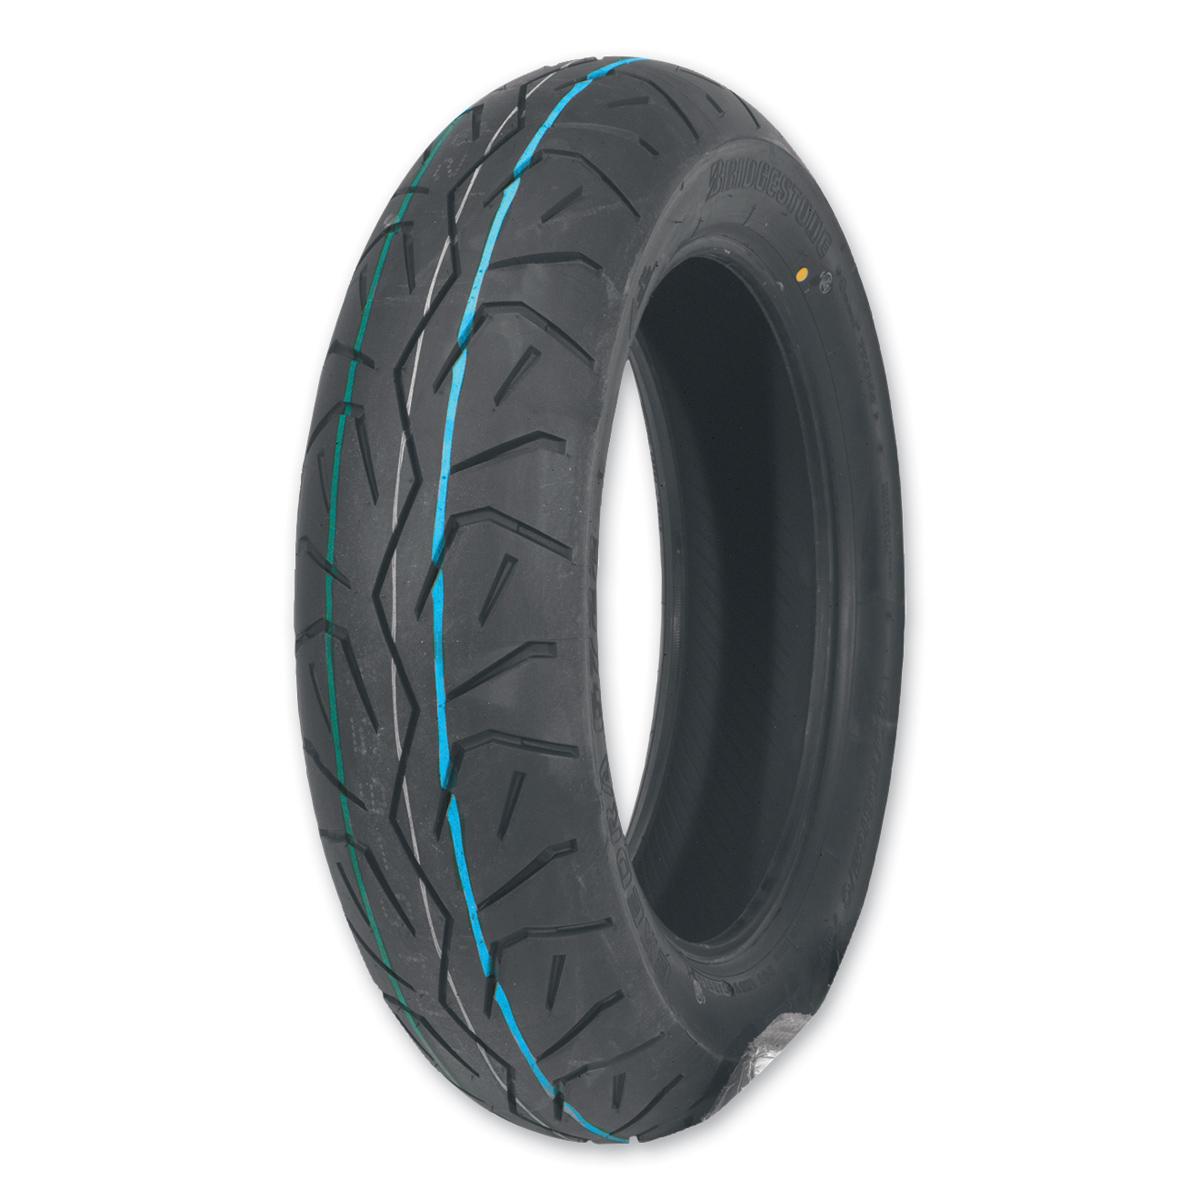 Bridgestone G722-G 180/70-15 Rear Tire